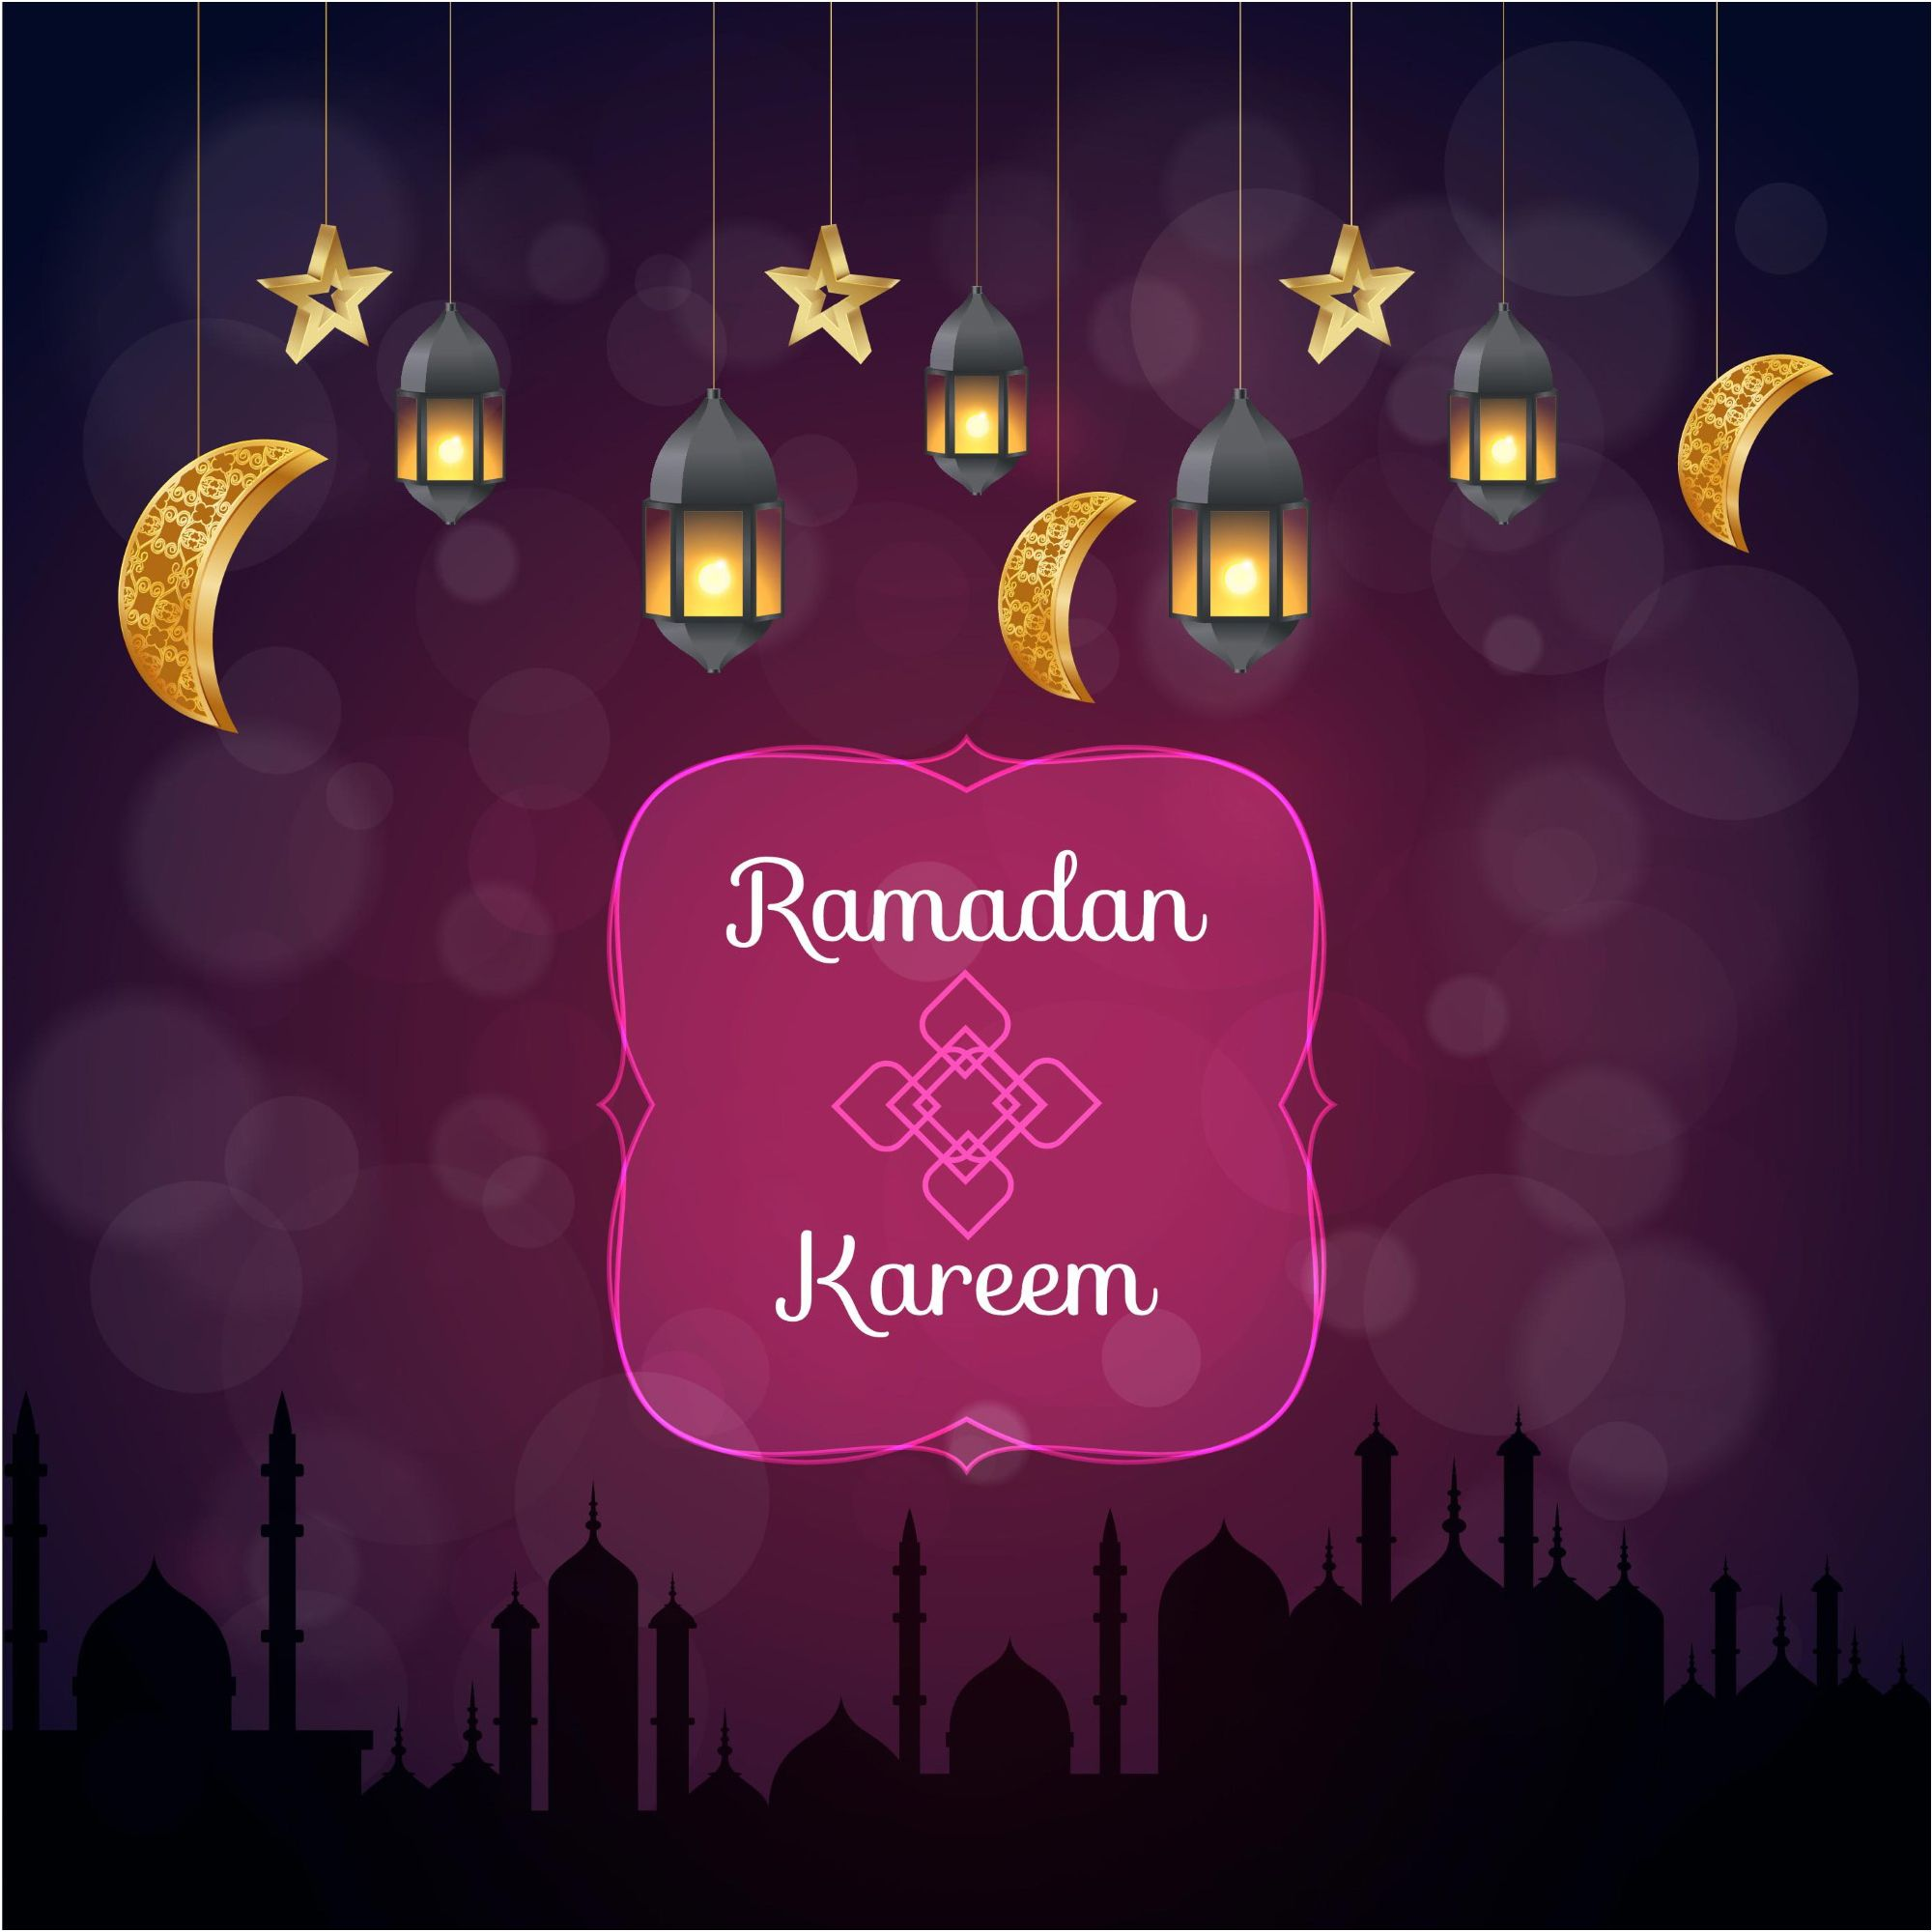 Ramadan Kareem Cute Greeting Card Vector & Wallpaper http://www.cgvector.com/50-vector-graphics-eid-greeting-card-and-wallpaper/